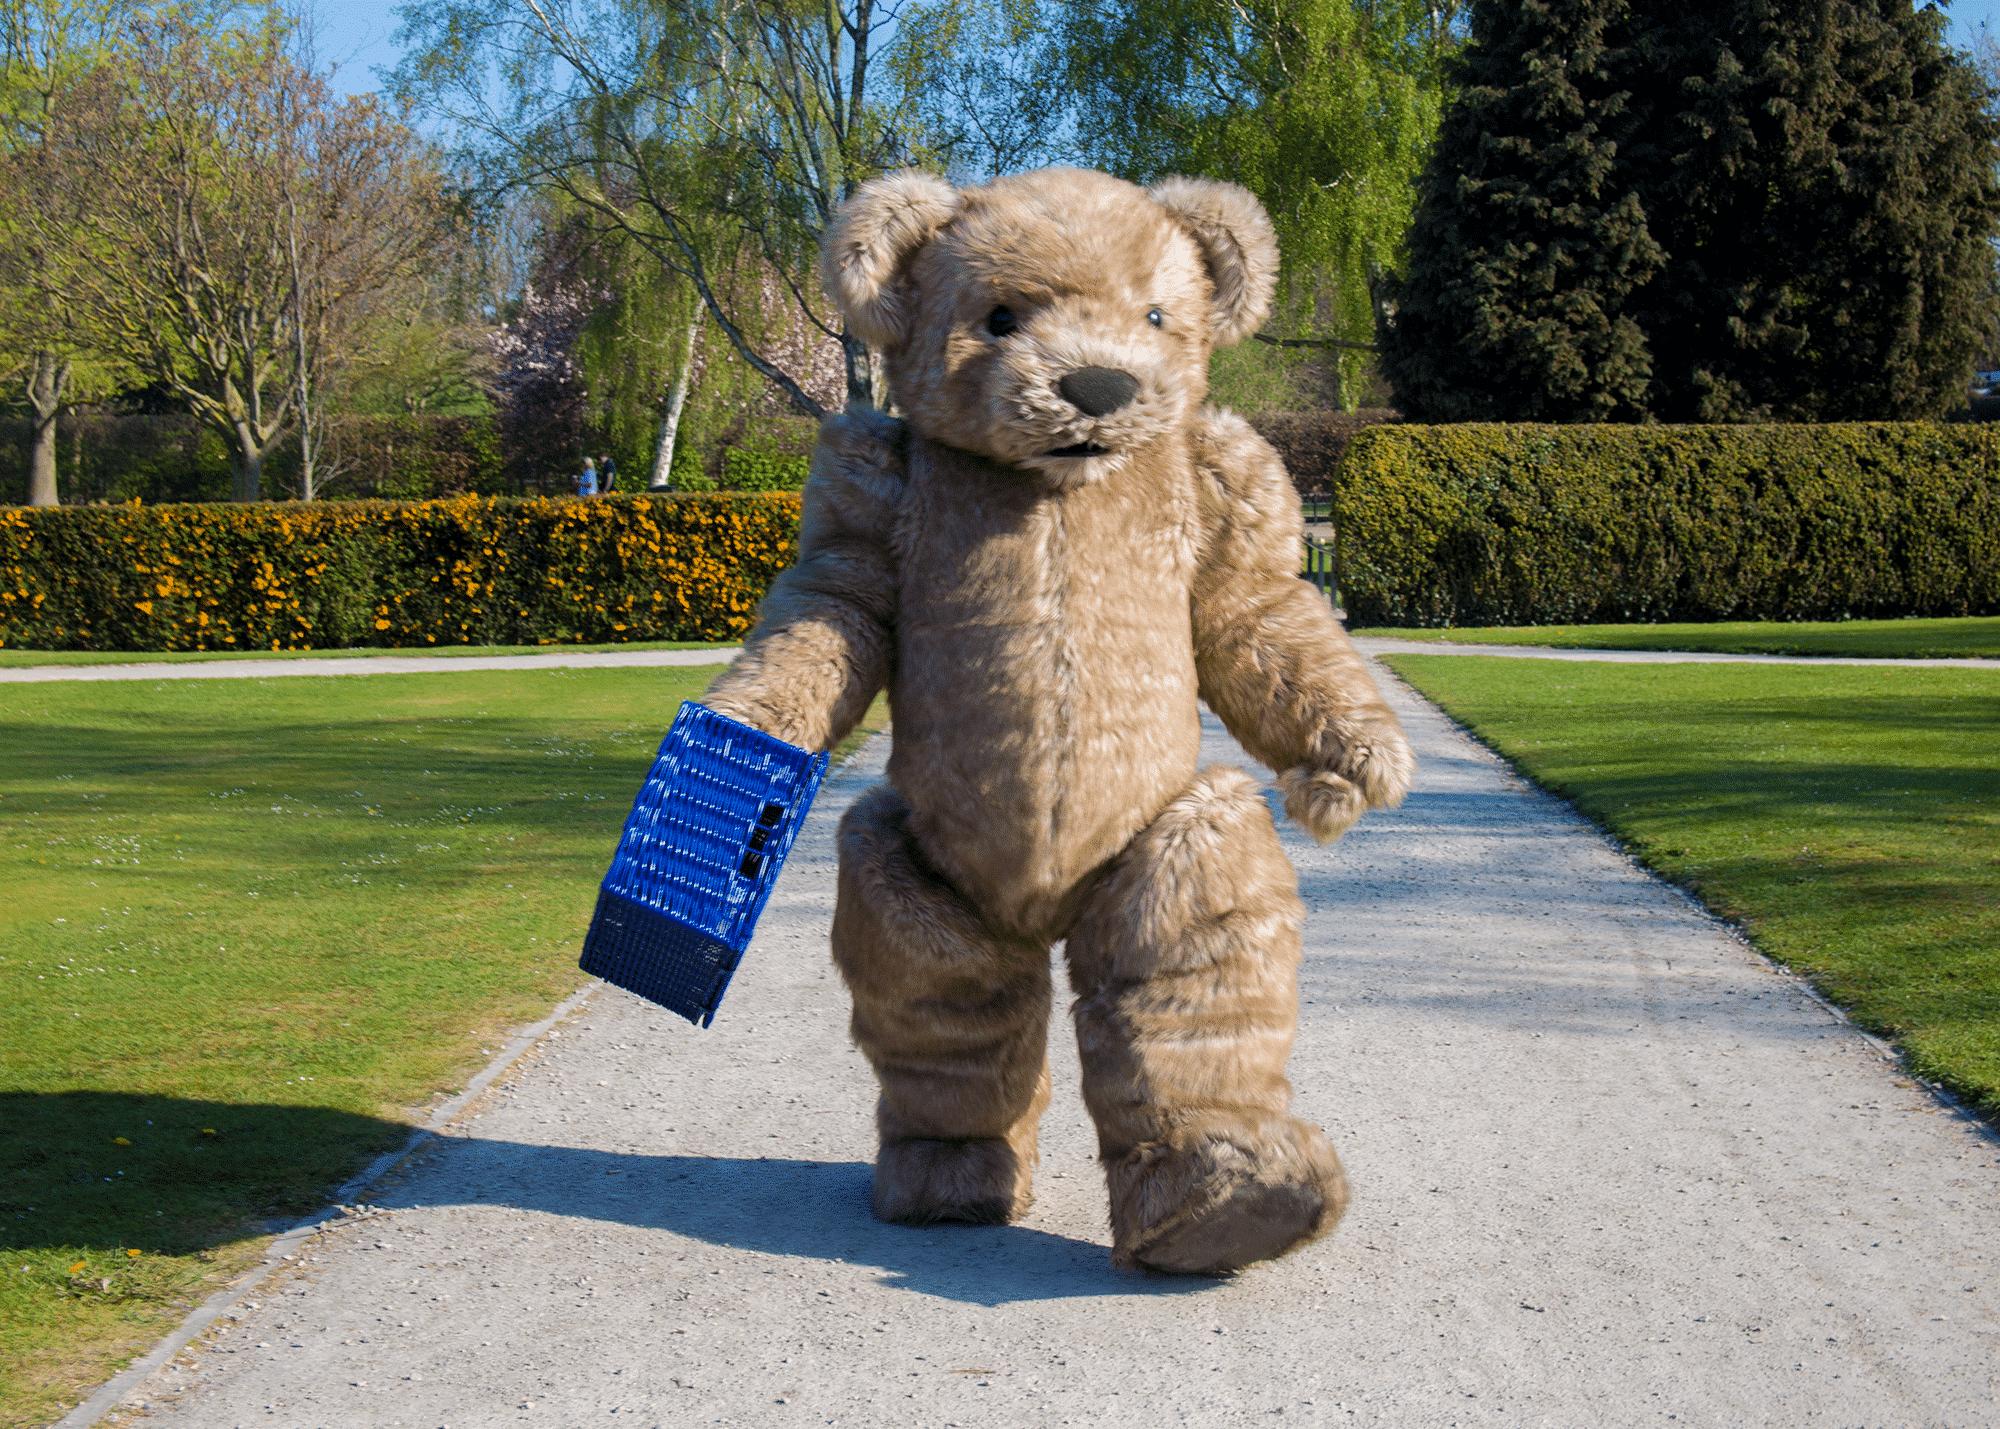 Realistic teddy bear costume filming